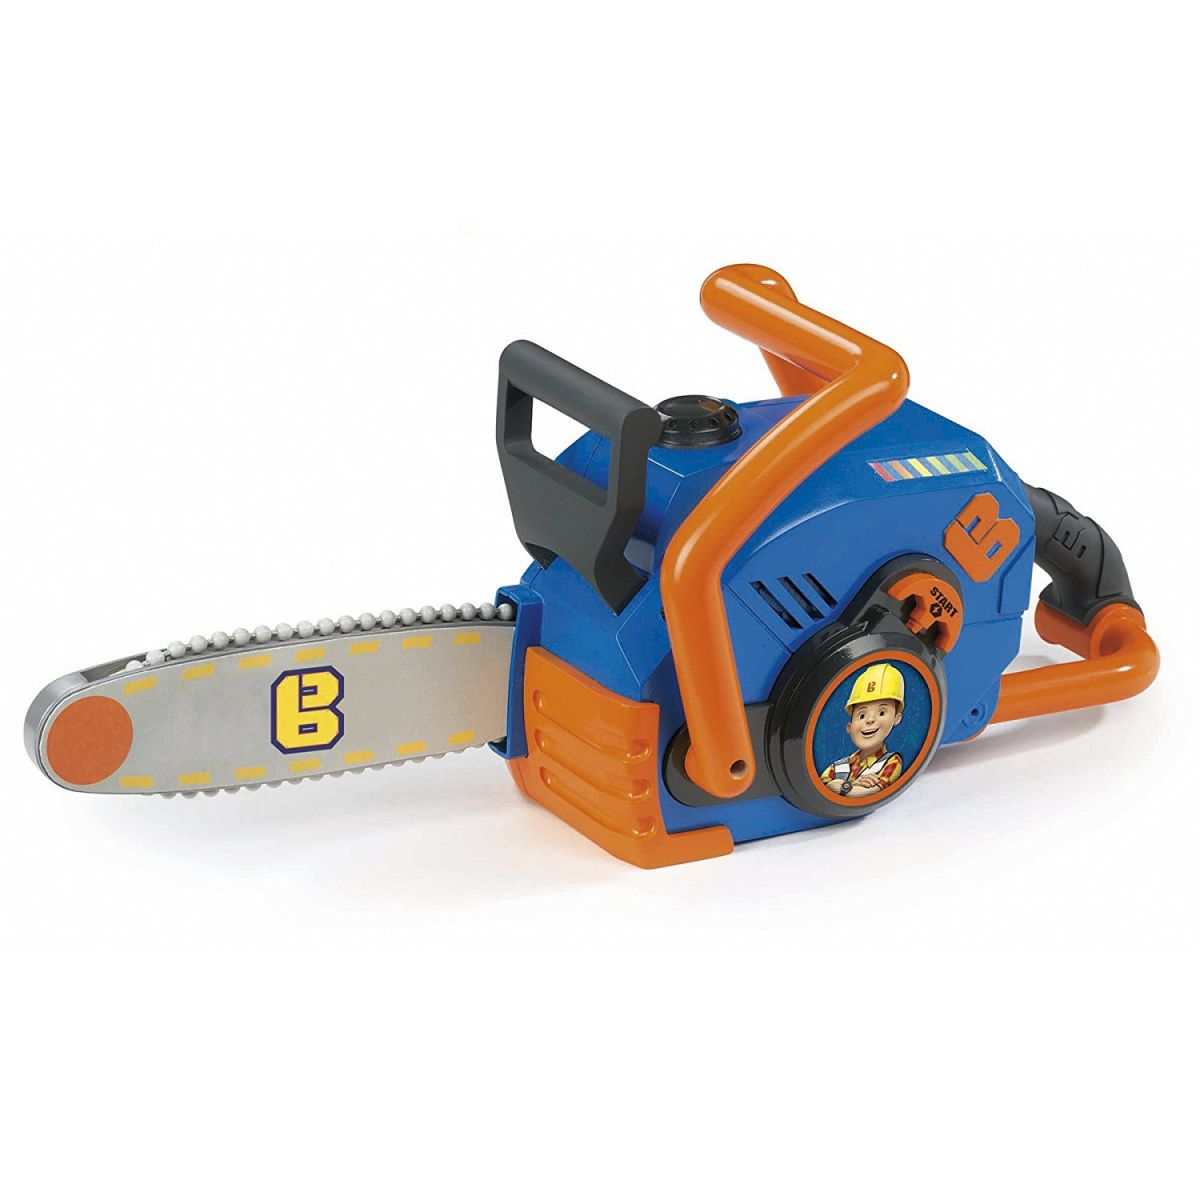 Smoby Detská motorová píla Staviteľ Bob elektronická s pohyblivou reťazou